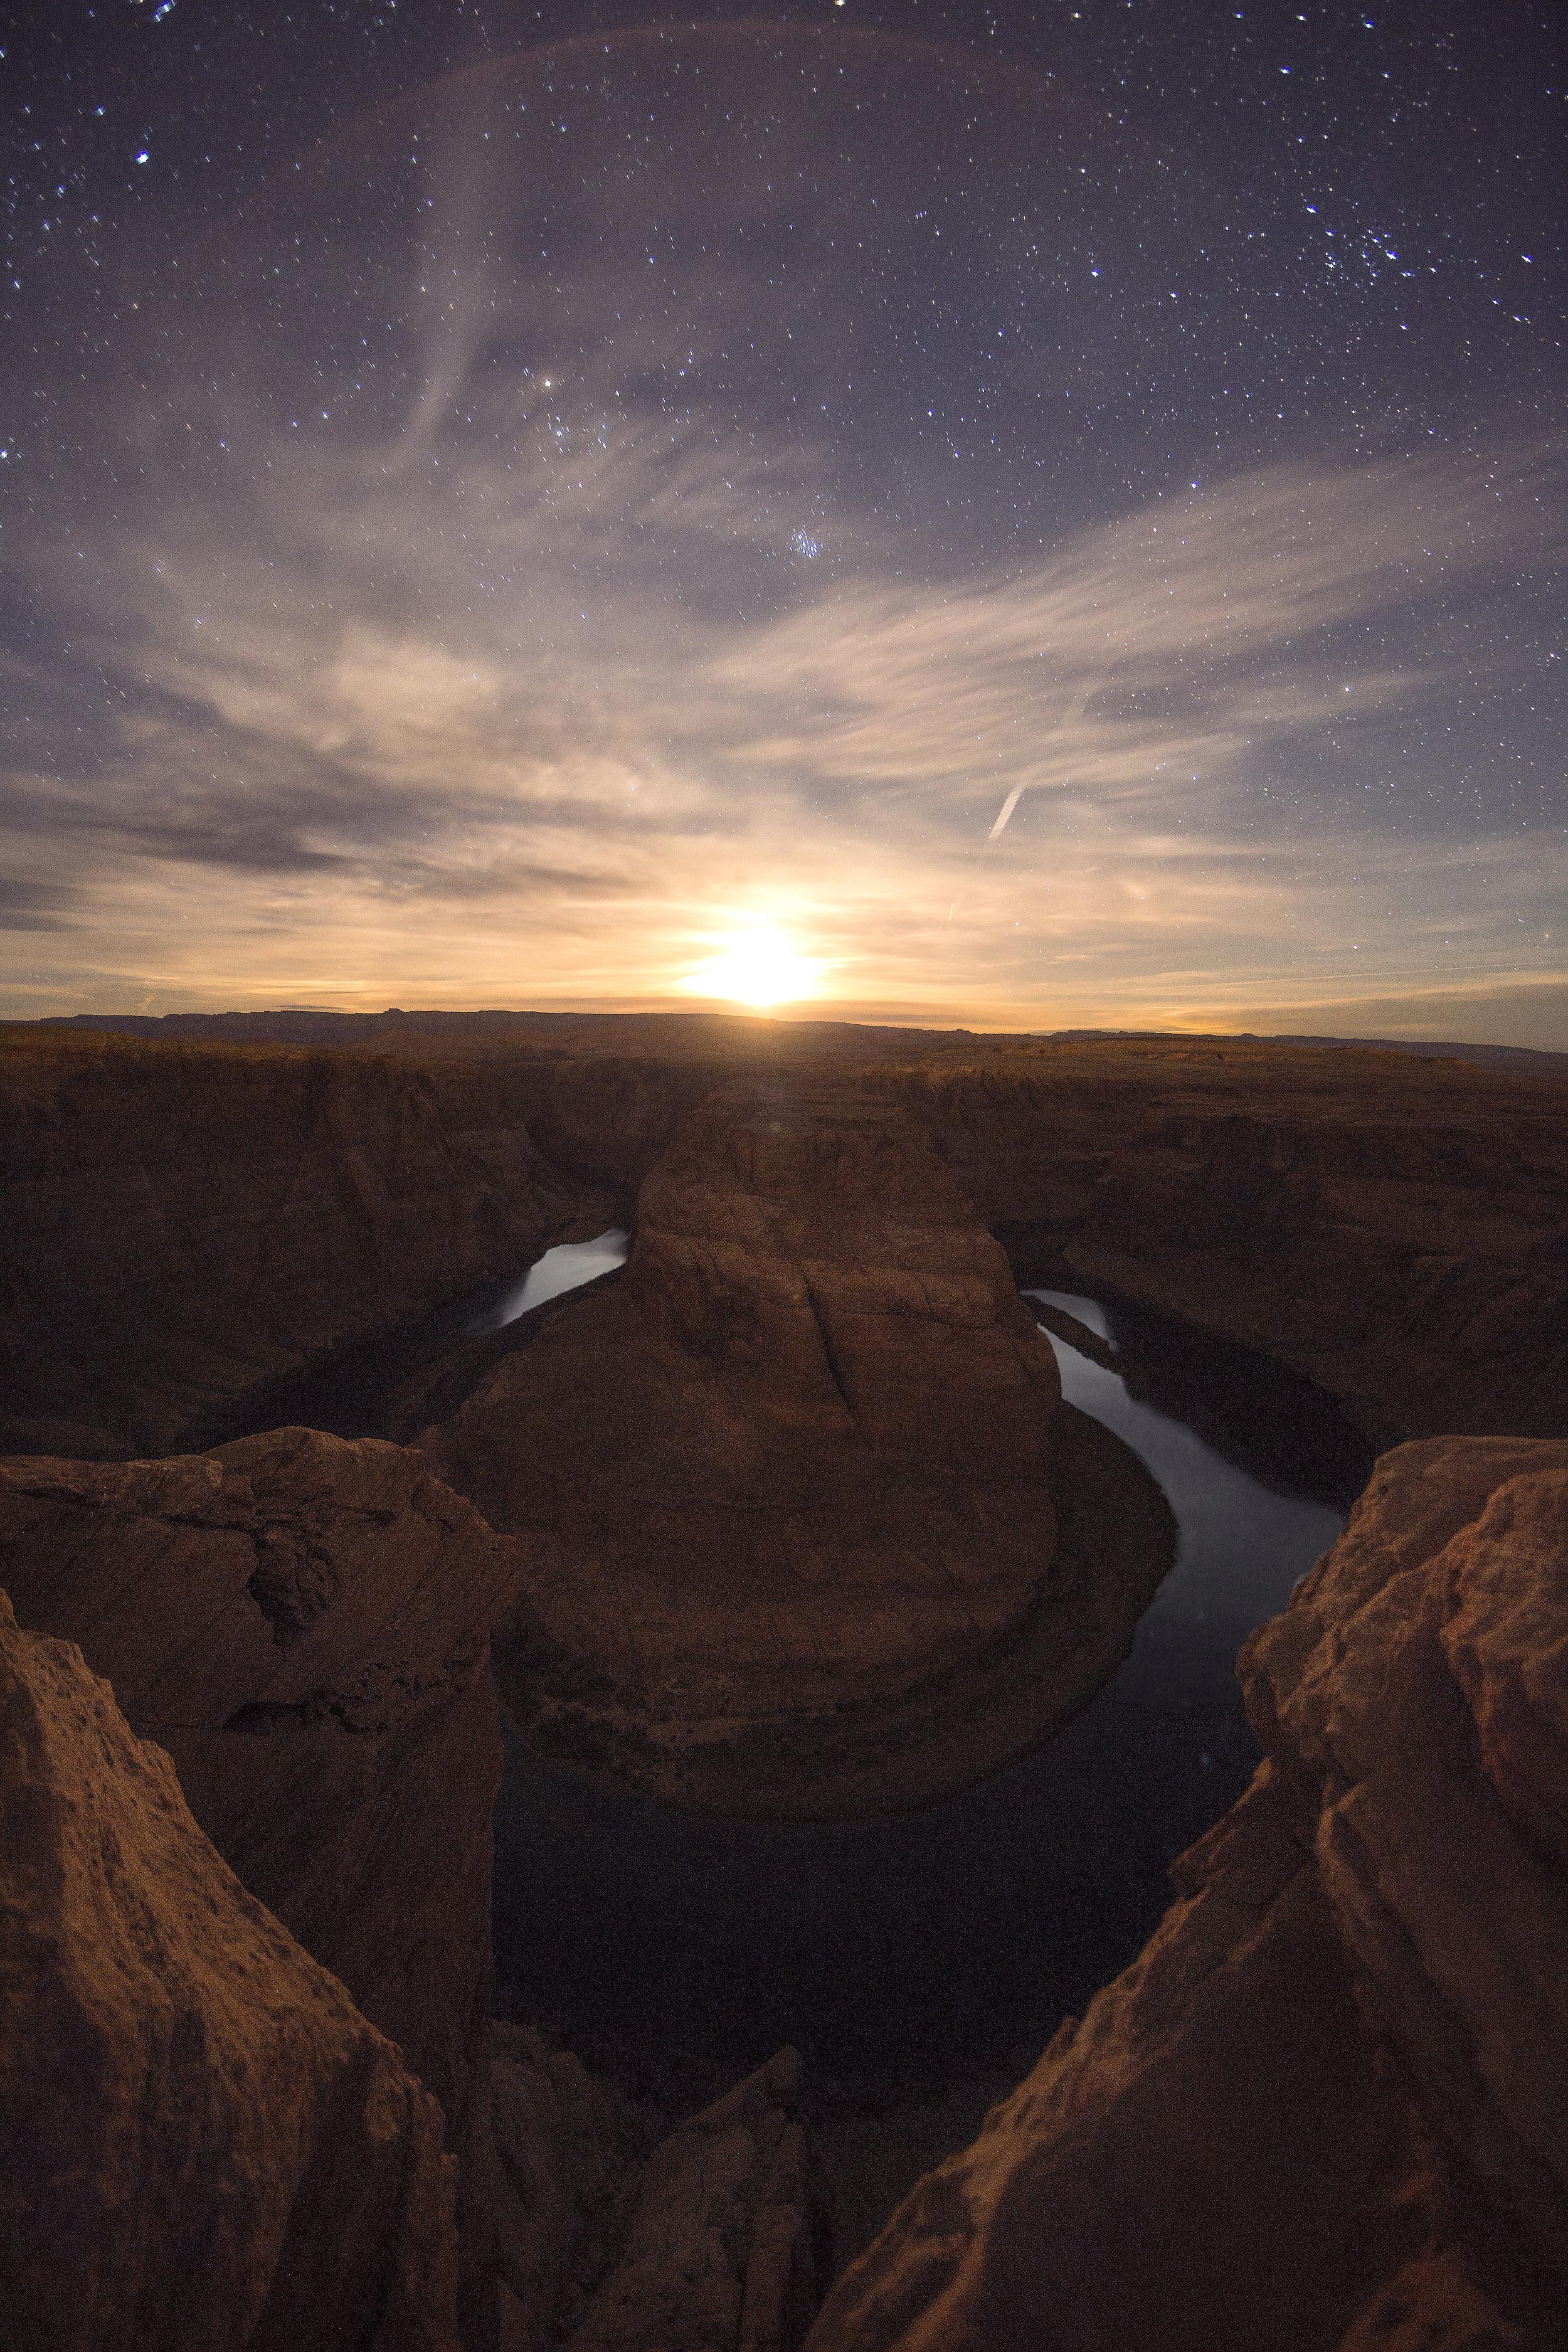 Moonset at Horseshoe Bend in Page, Arizona